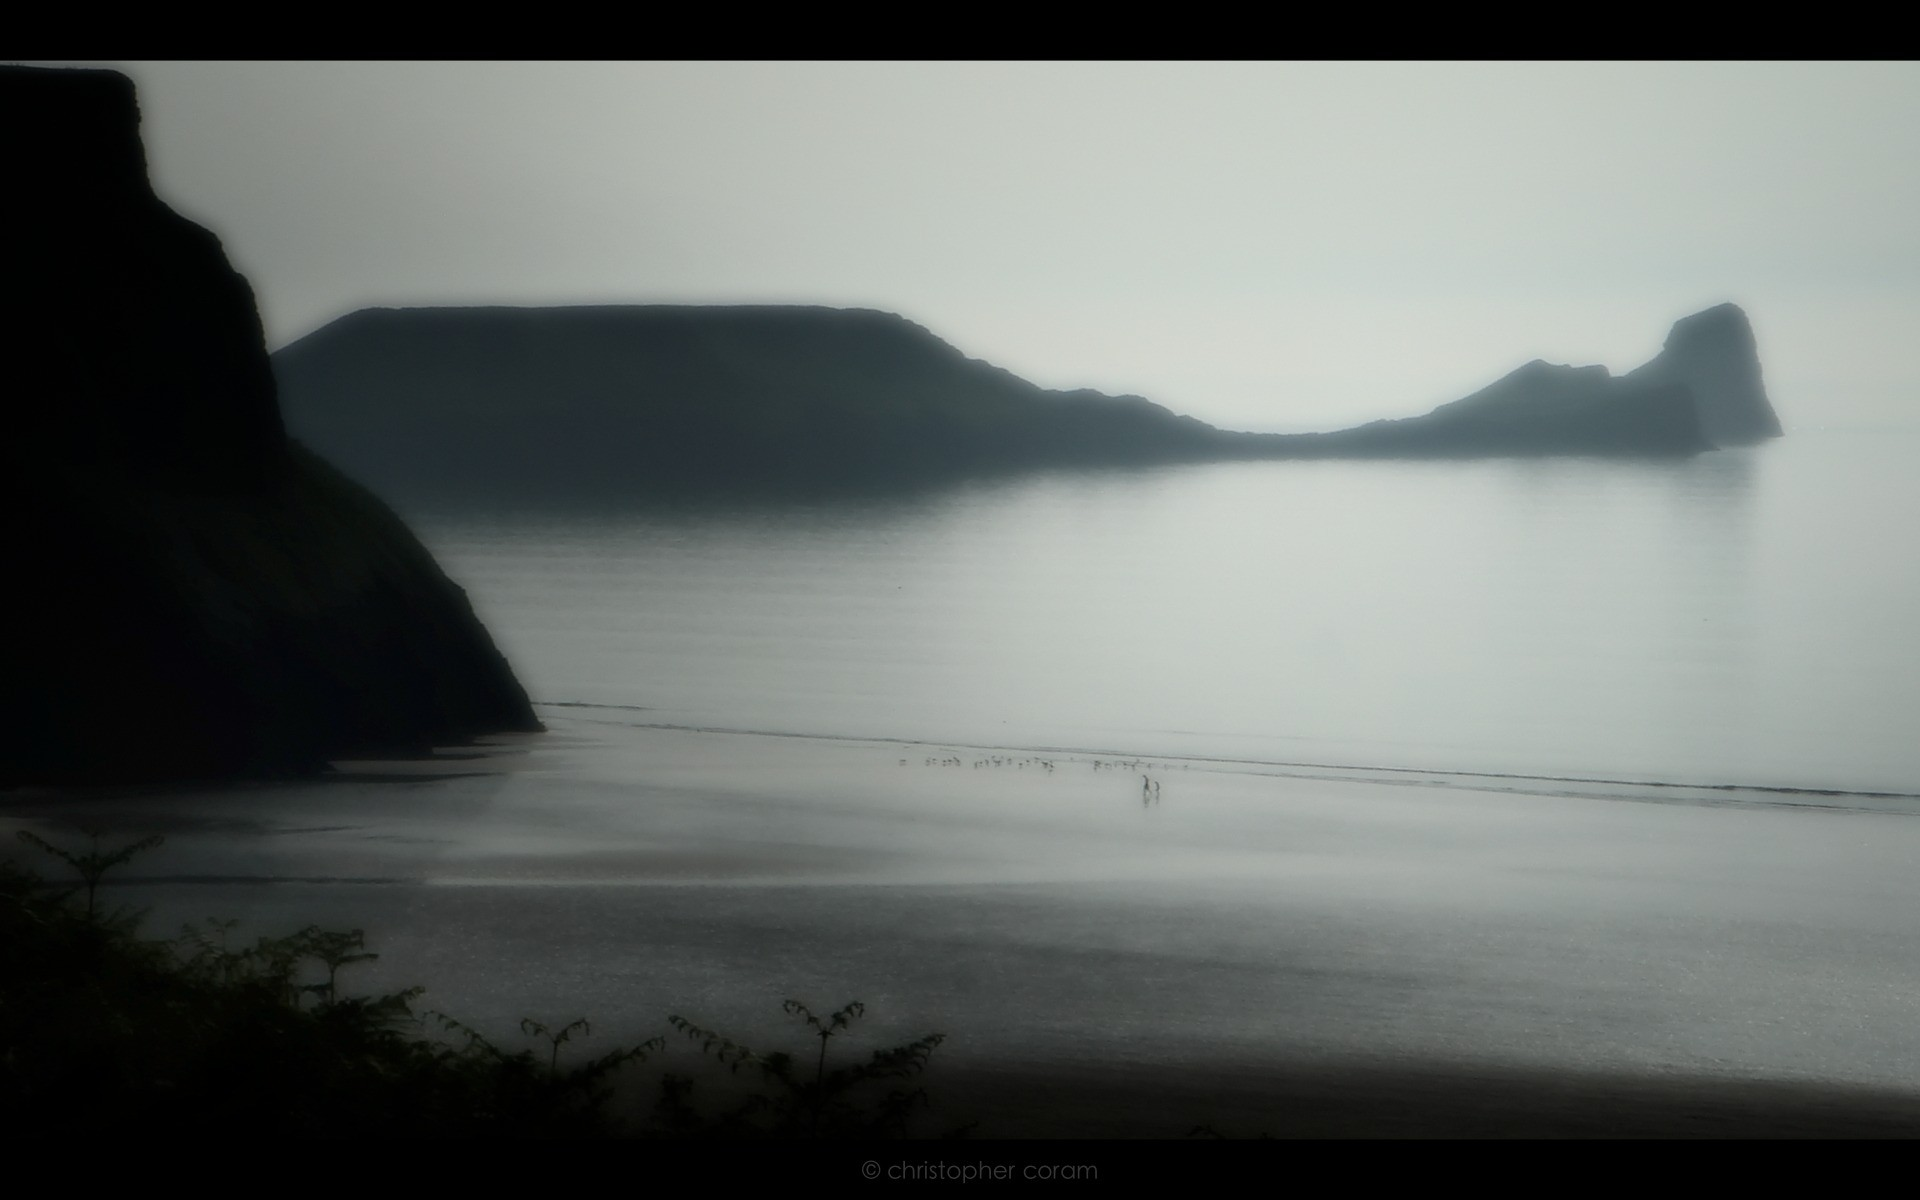 Beaches: Walking Worm Wales Darking Blue Sky Water Walk Evening ...